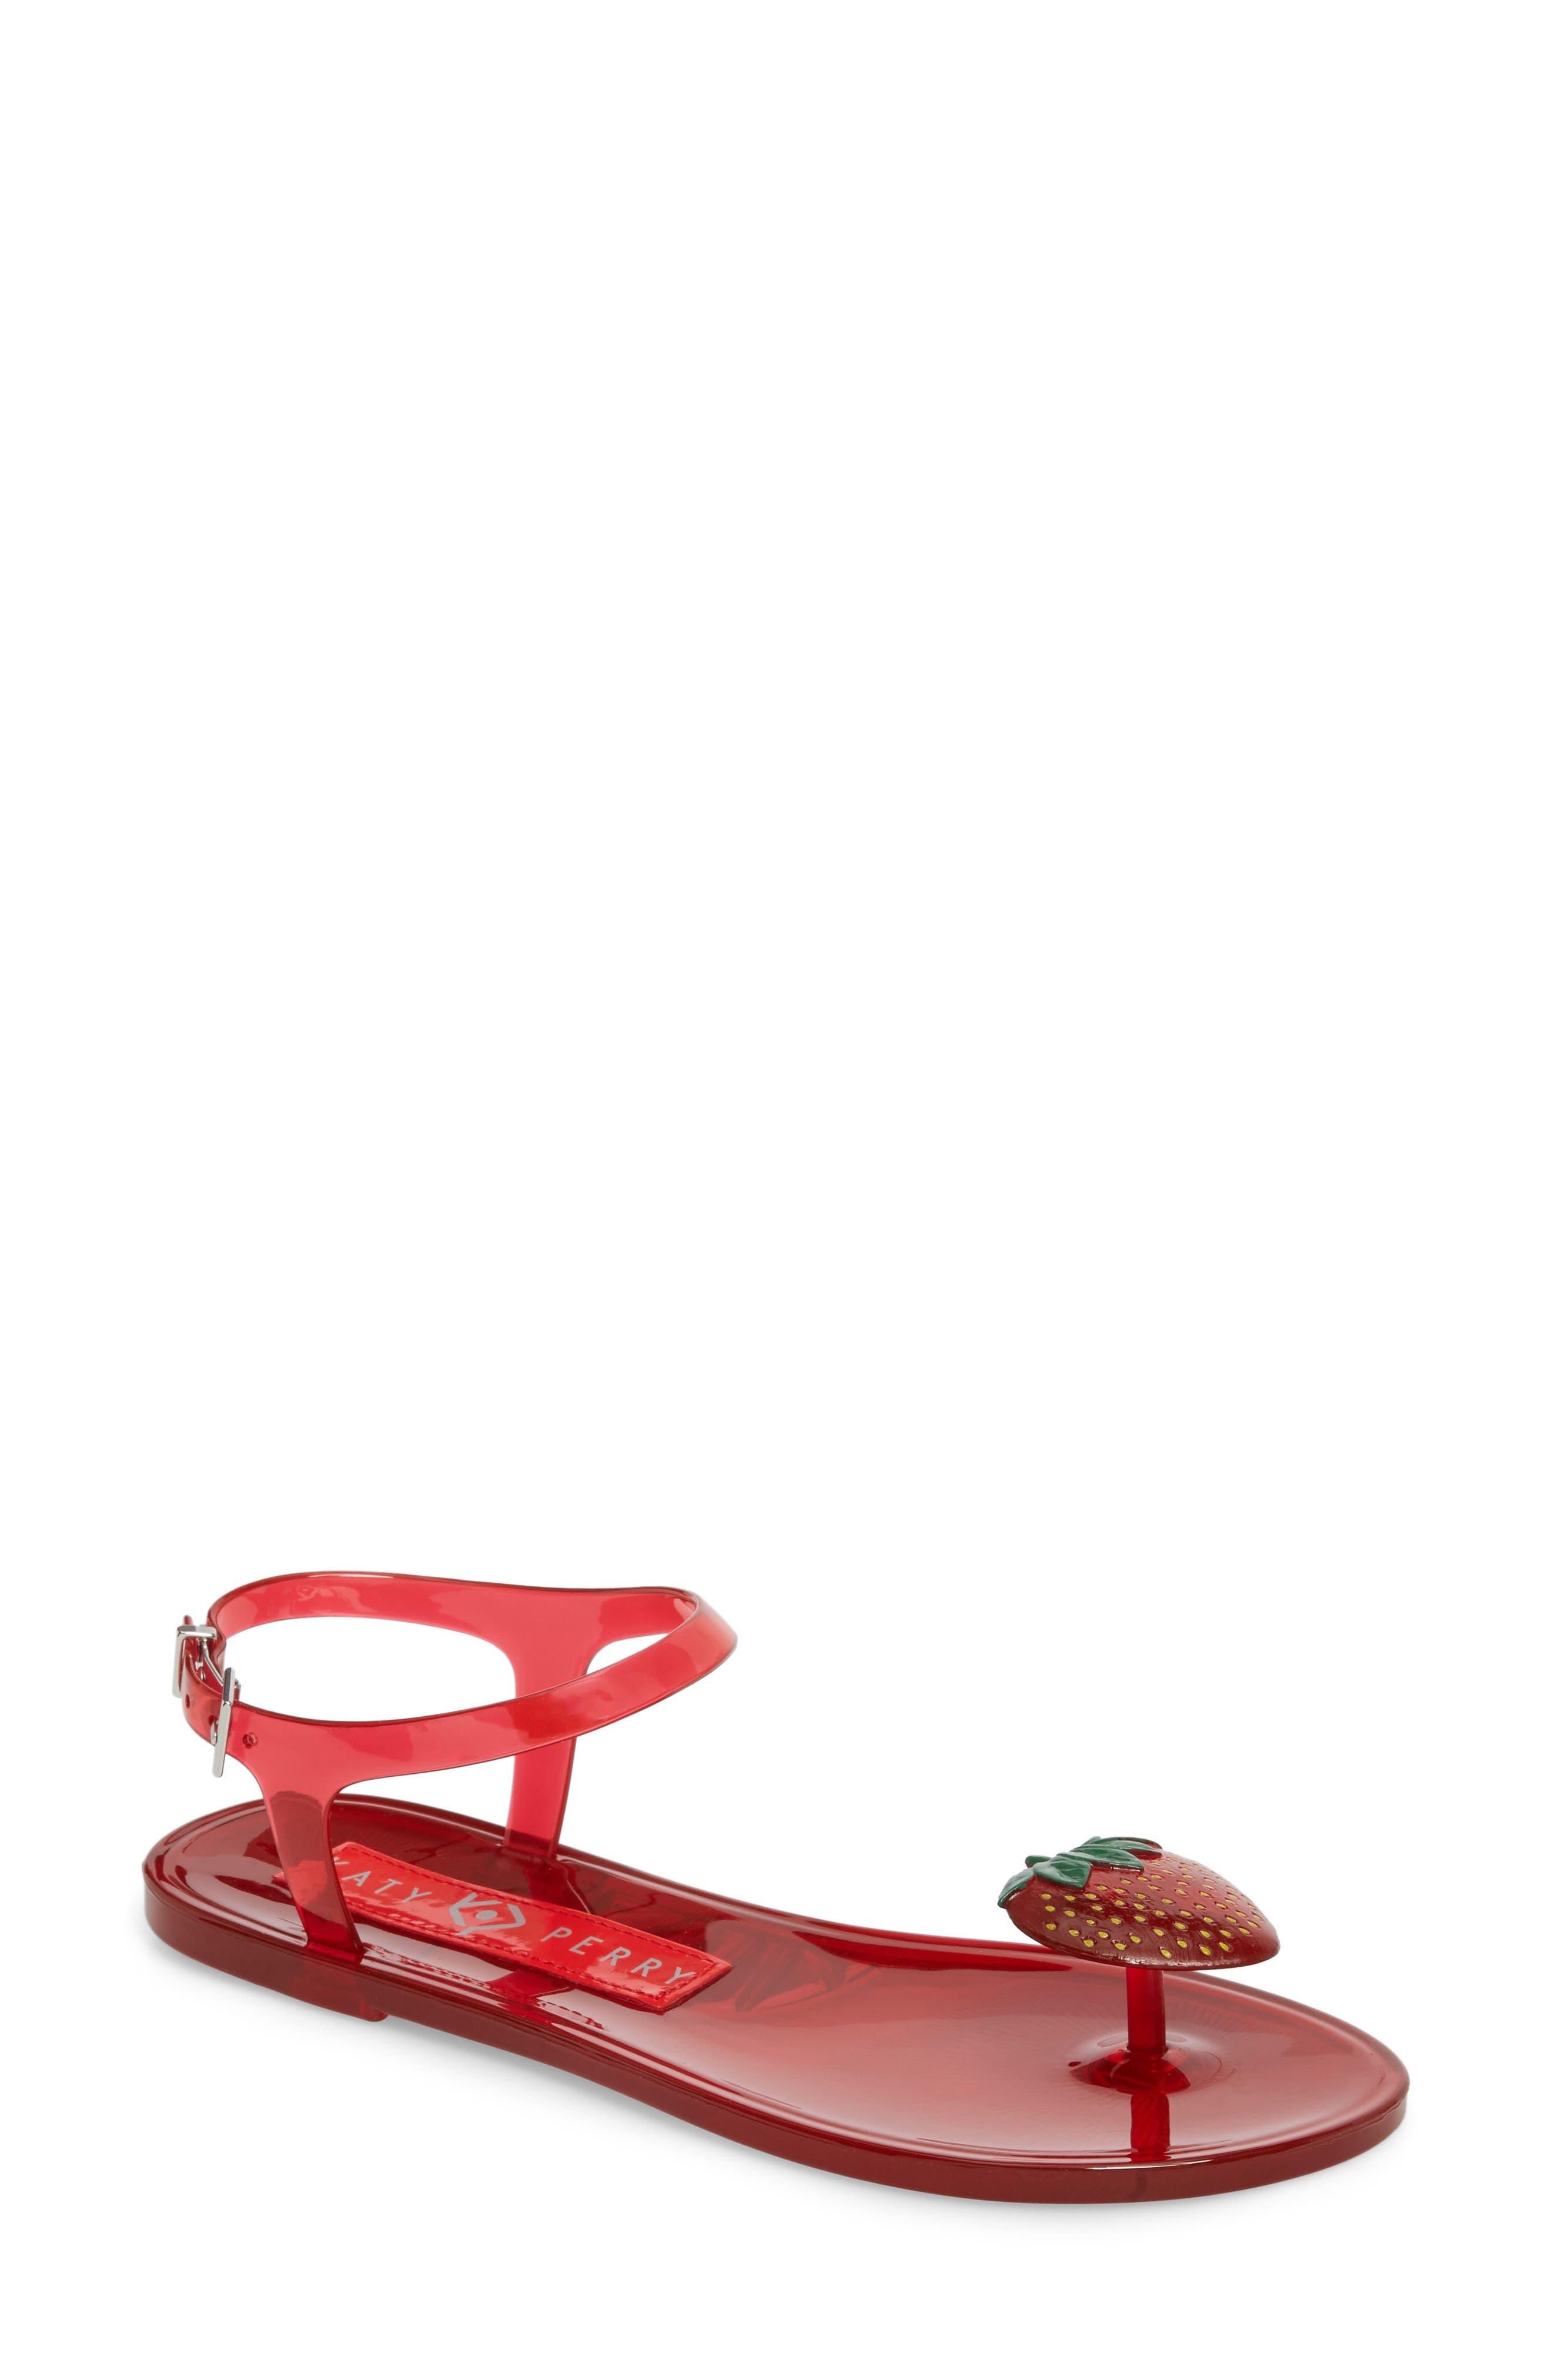 Image of Katy Perry Geli Sandal